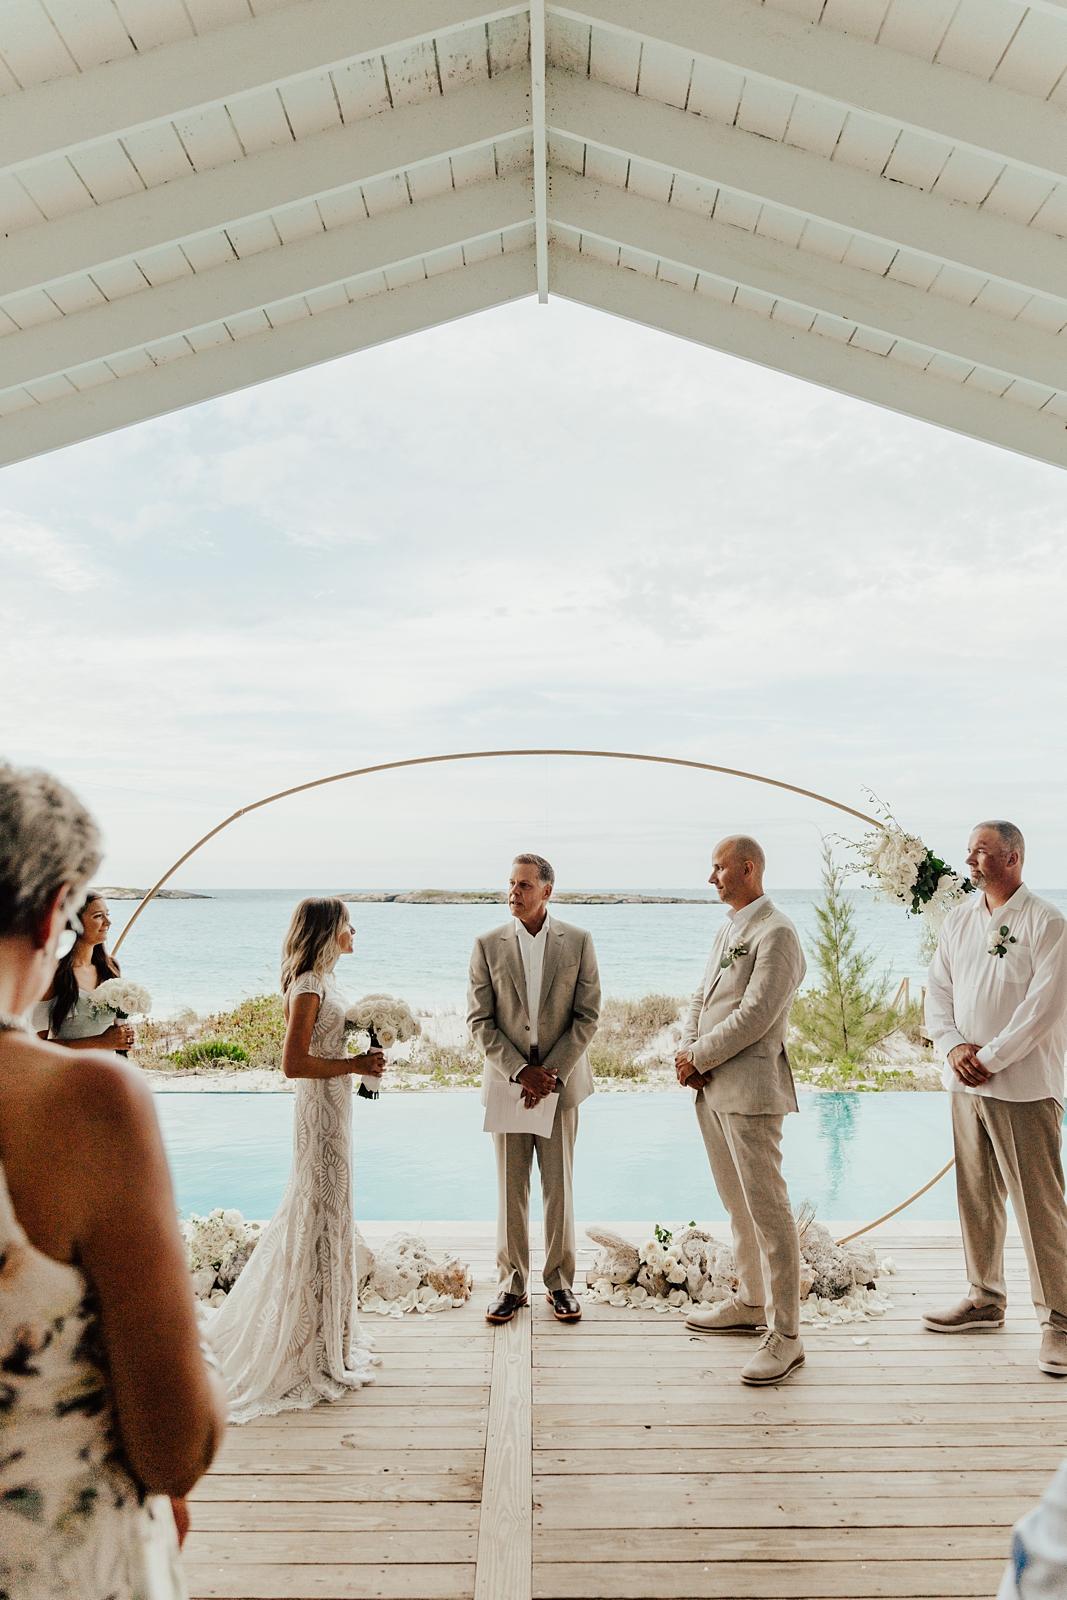 Jenni & Andrew Intimate Beach Destination Wedding in Little Exuma, Bahamas_0504.jpg